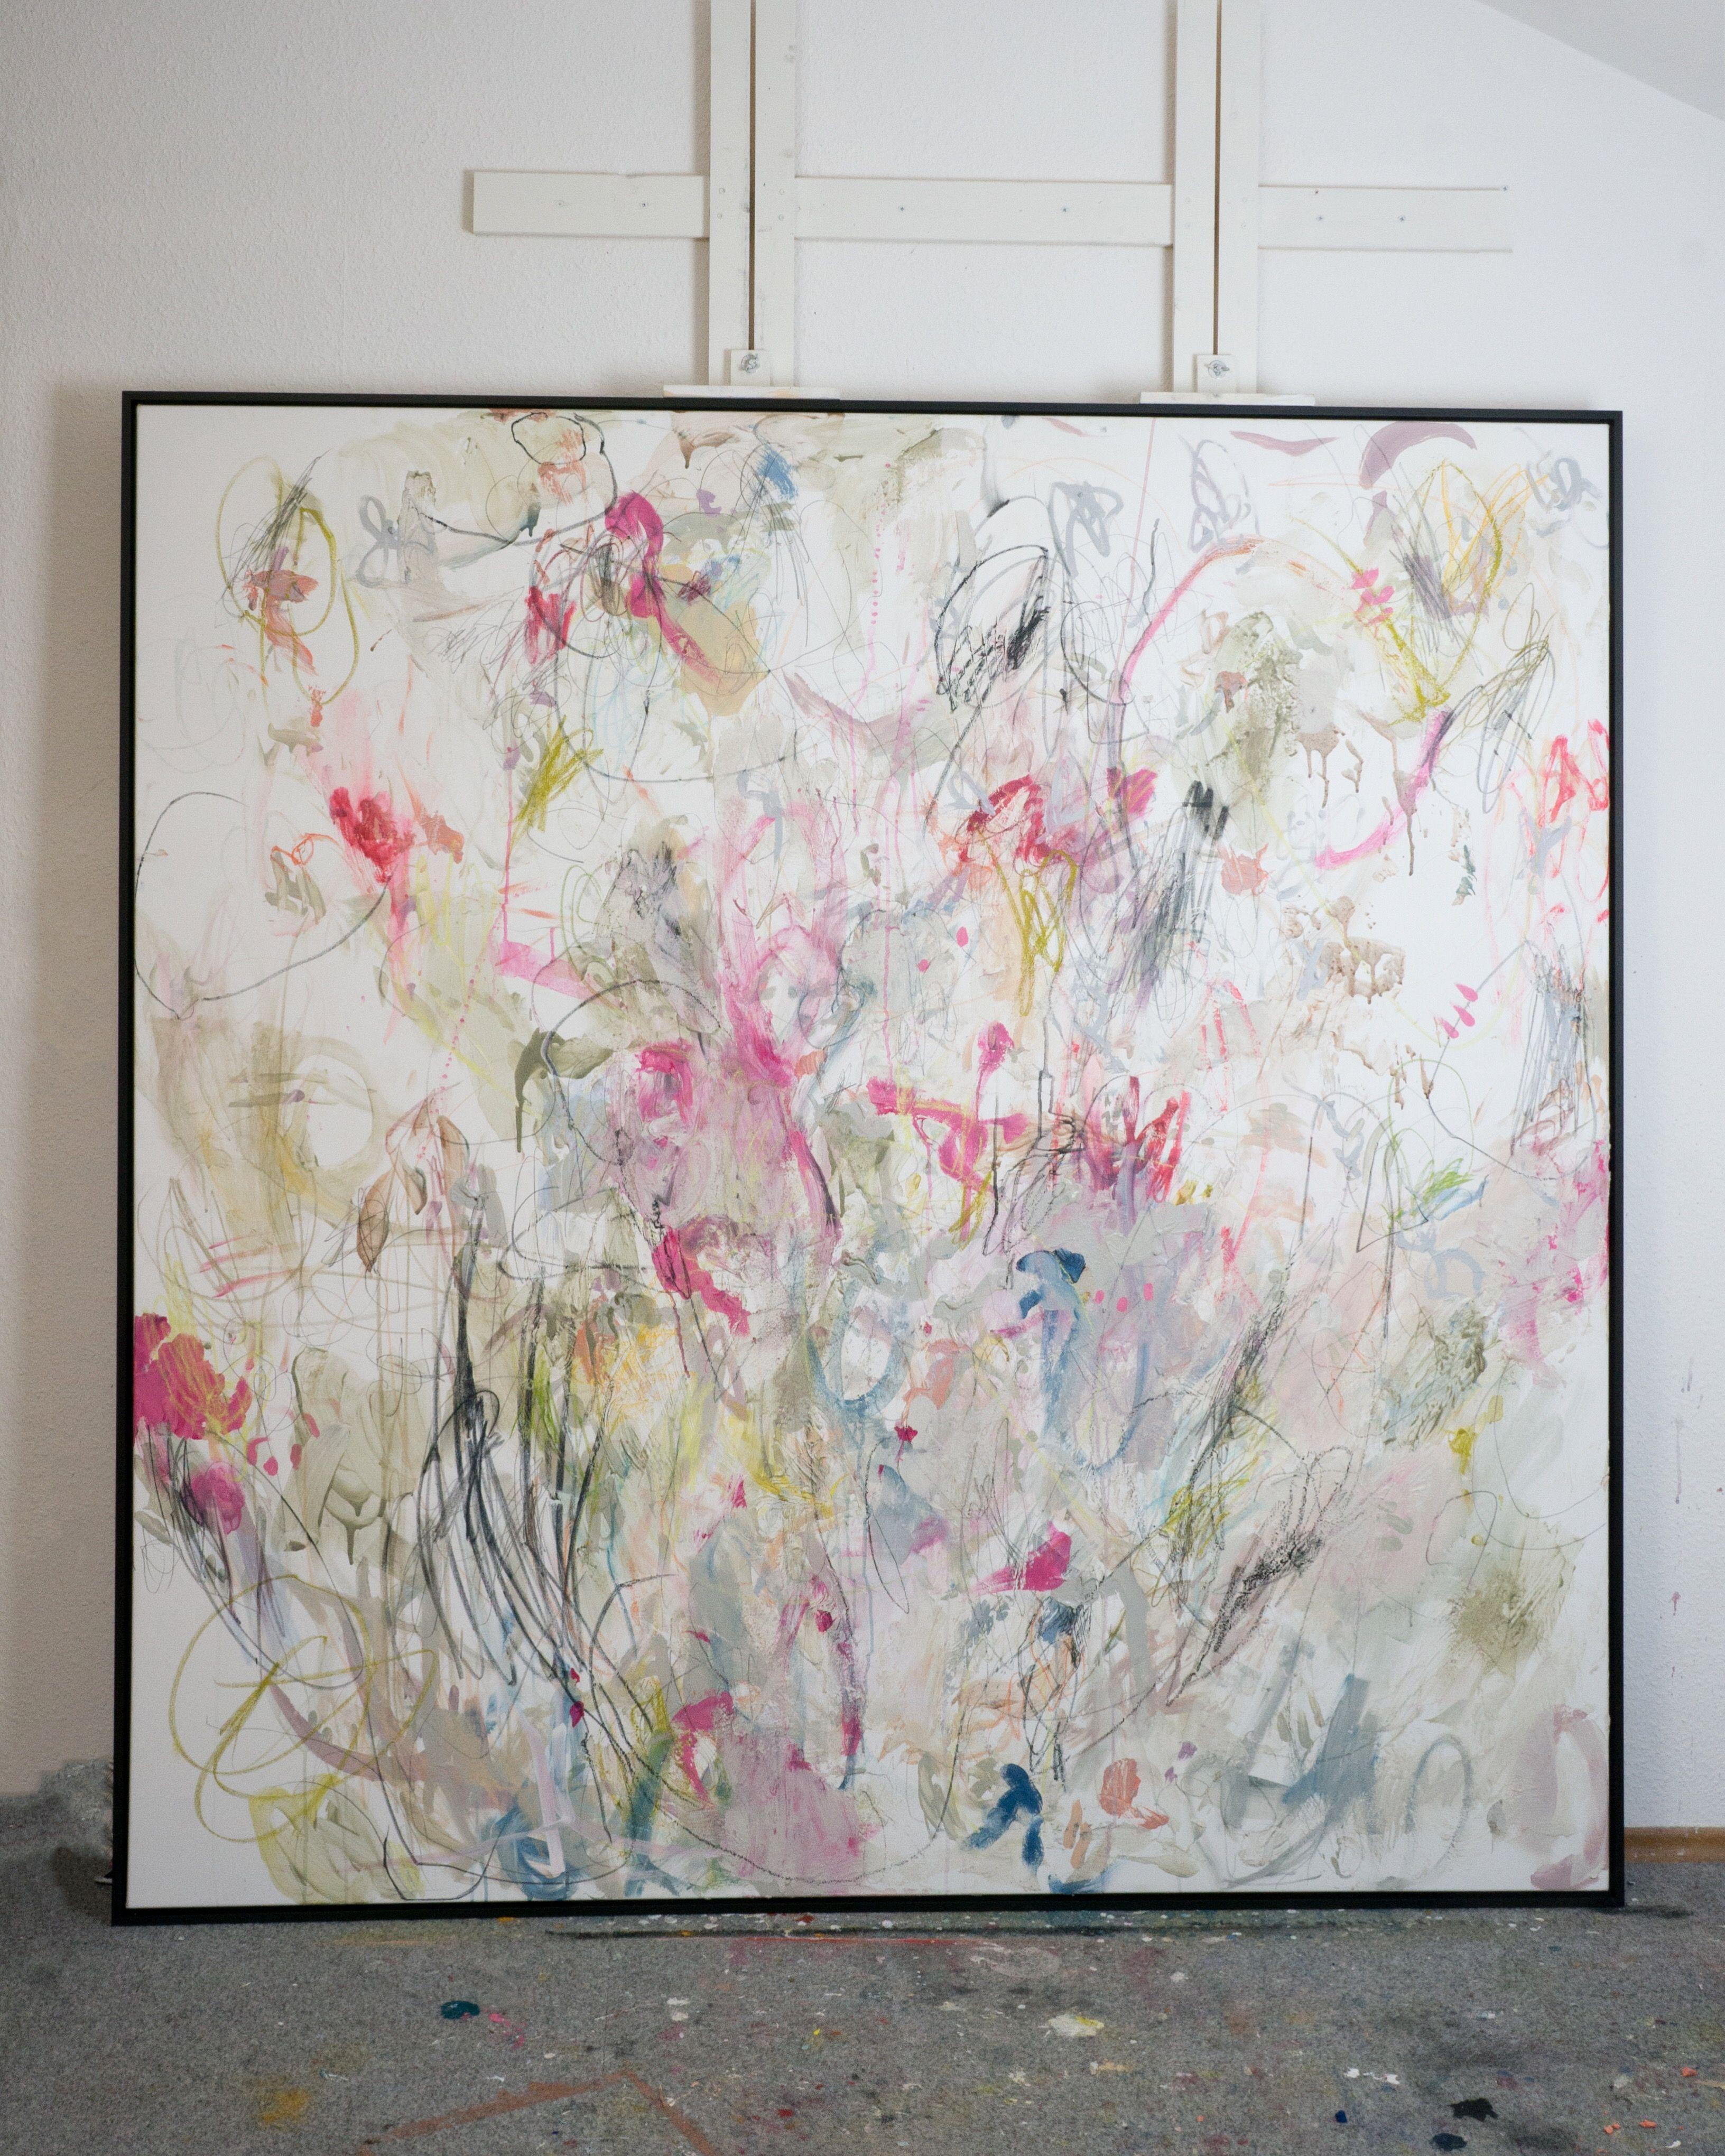 abstrakte kunst grossformat 170x170cm gerahmt katharina santl malerei abstrakt bilder 120x80 gemälde vögel